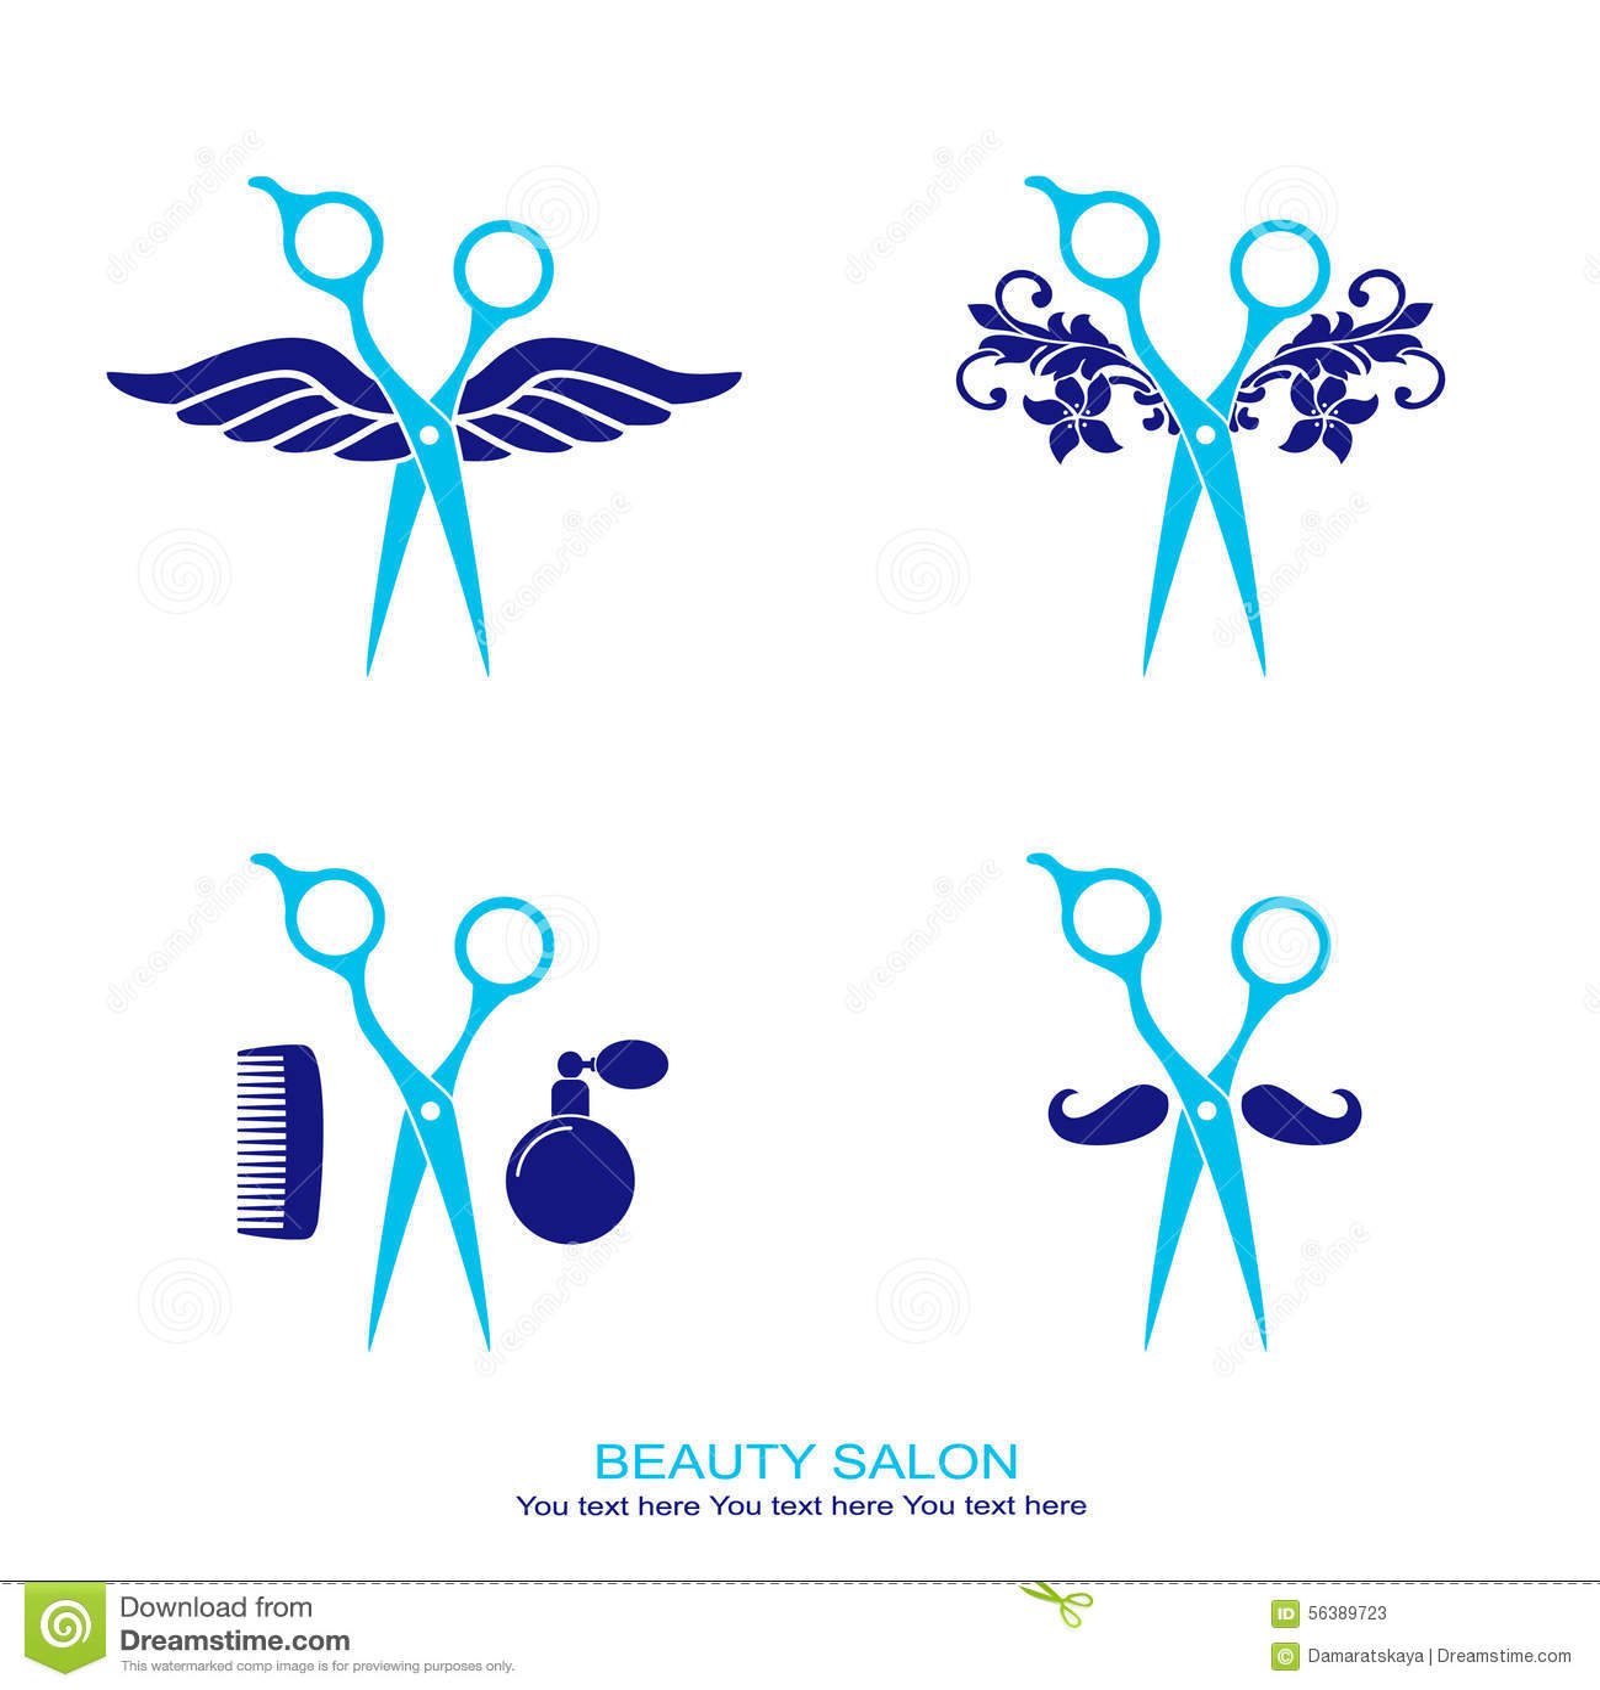 hair salon business plan